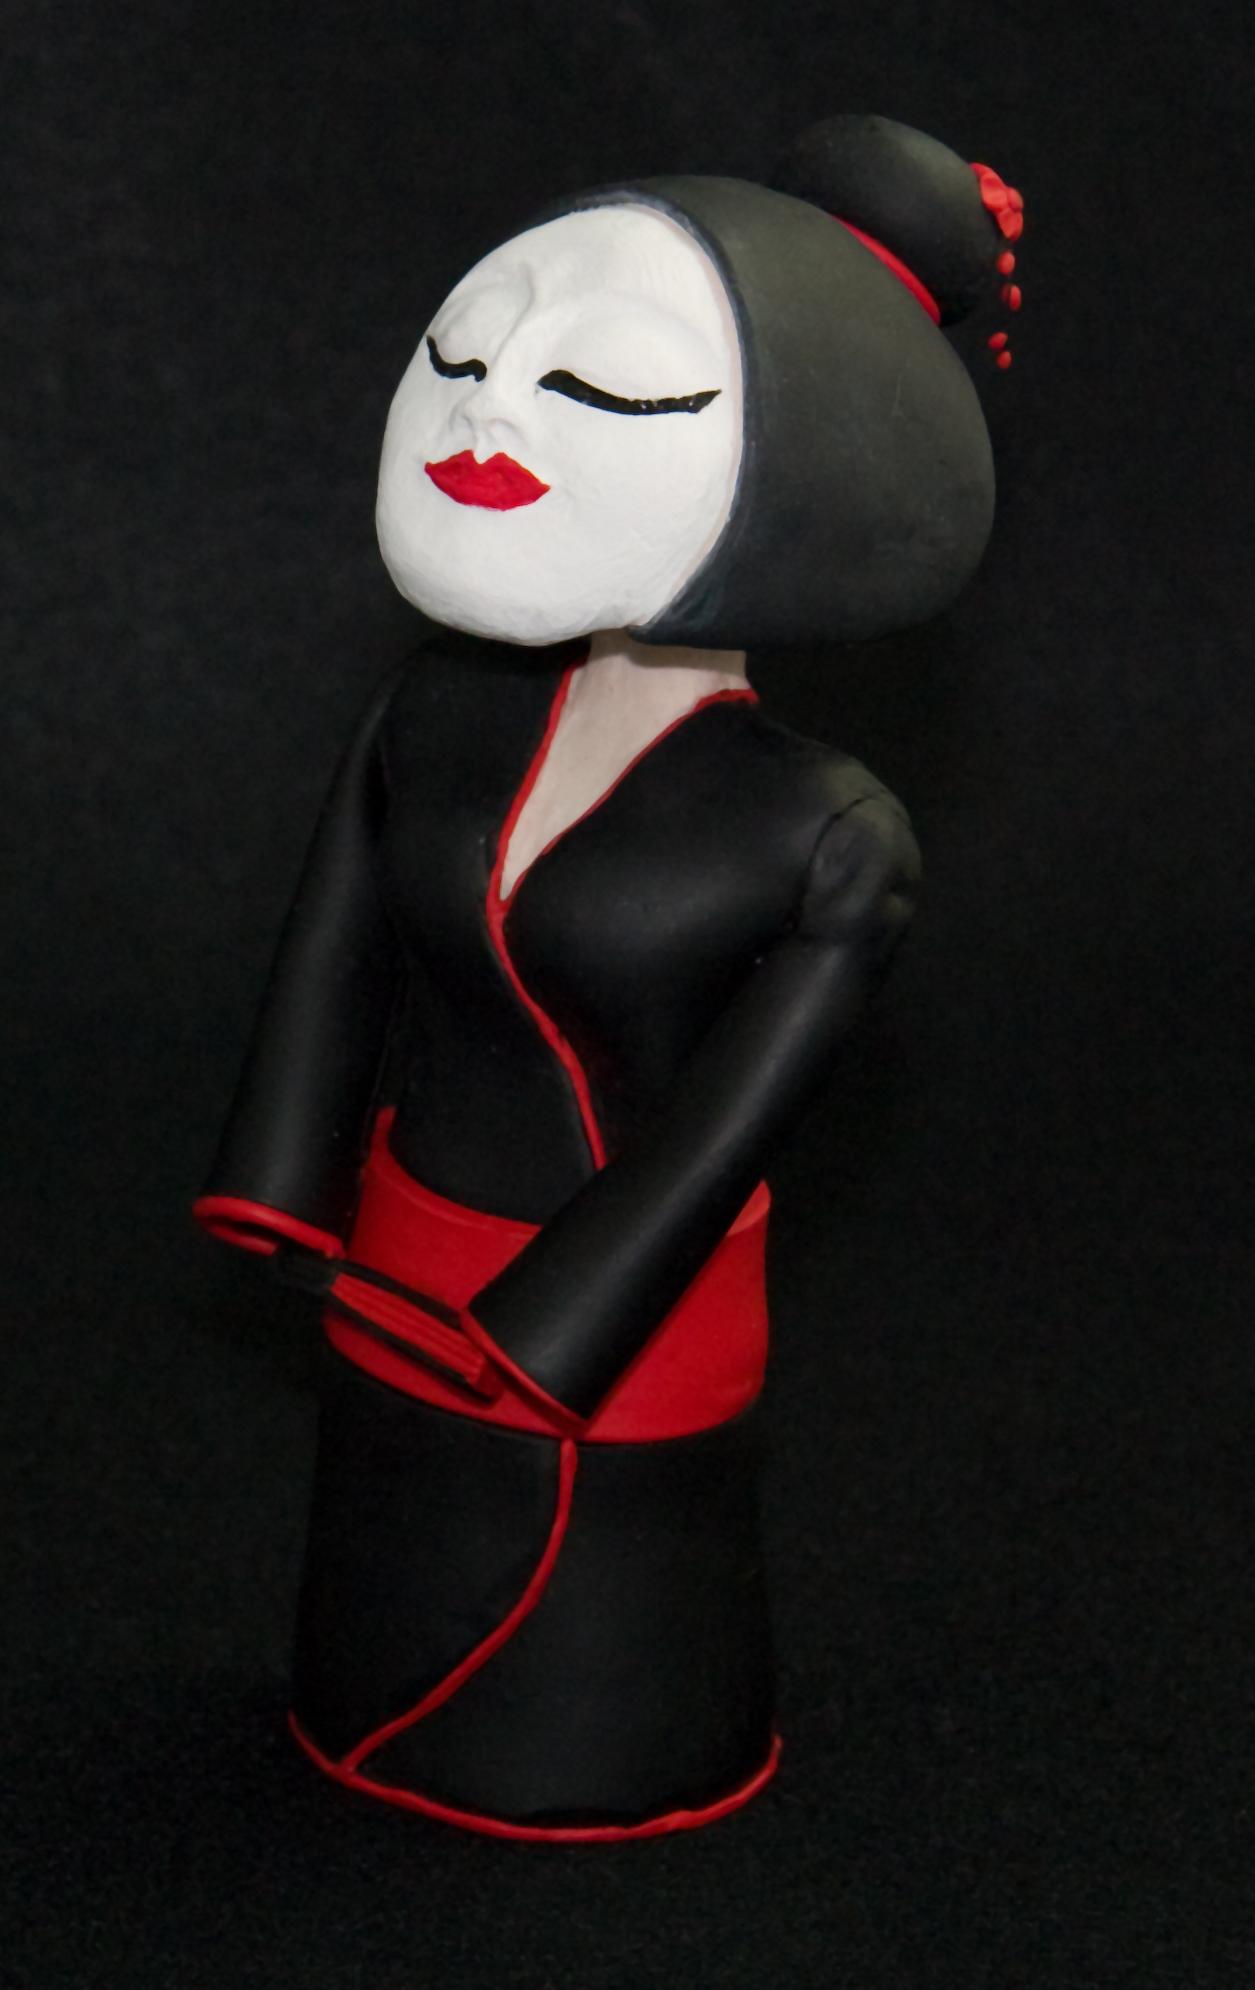 Bobble Headed Geisha Doll v2.0 by middypuppy